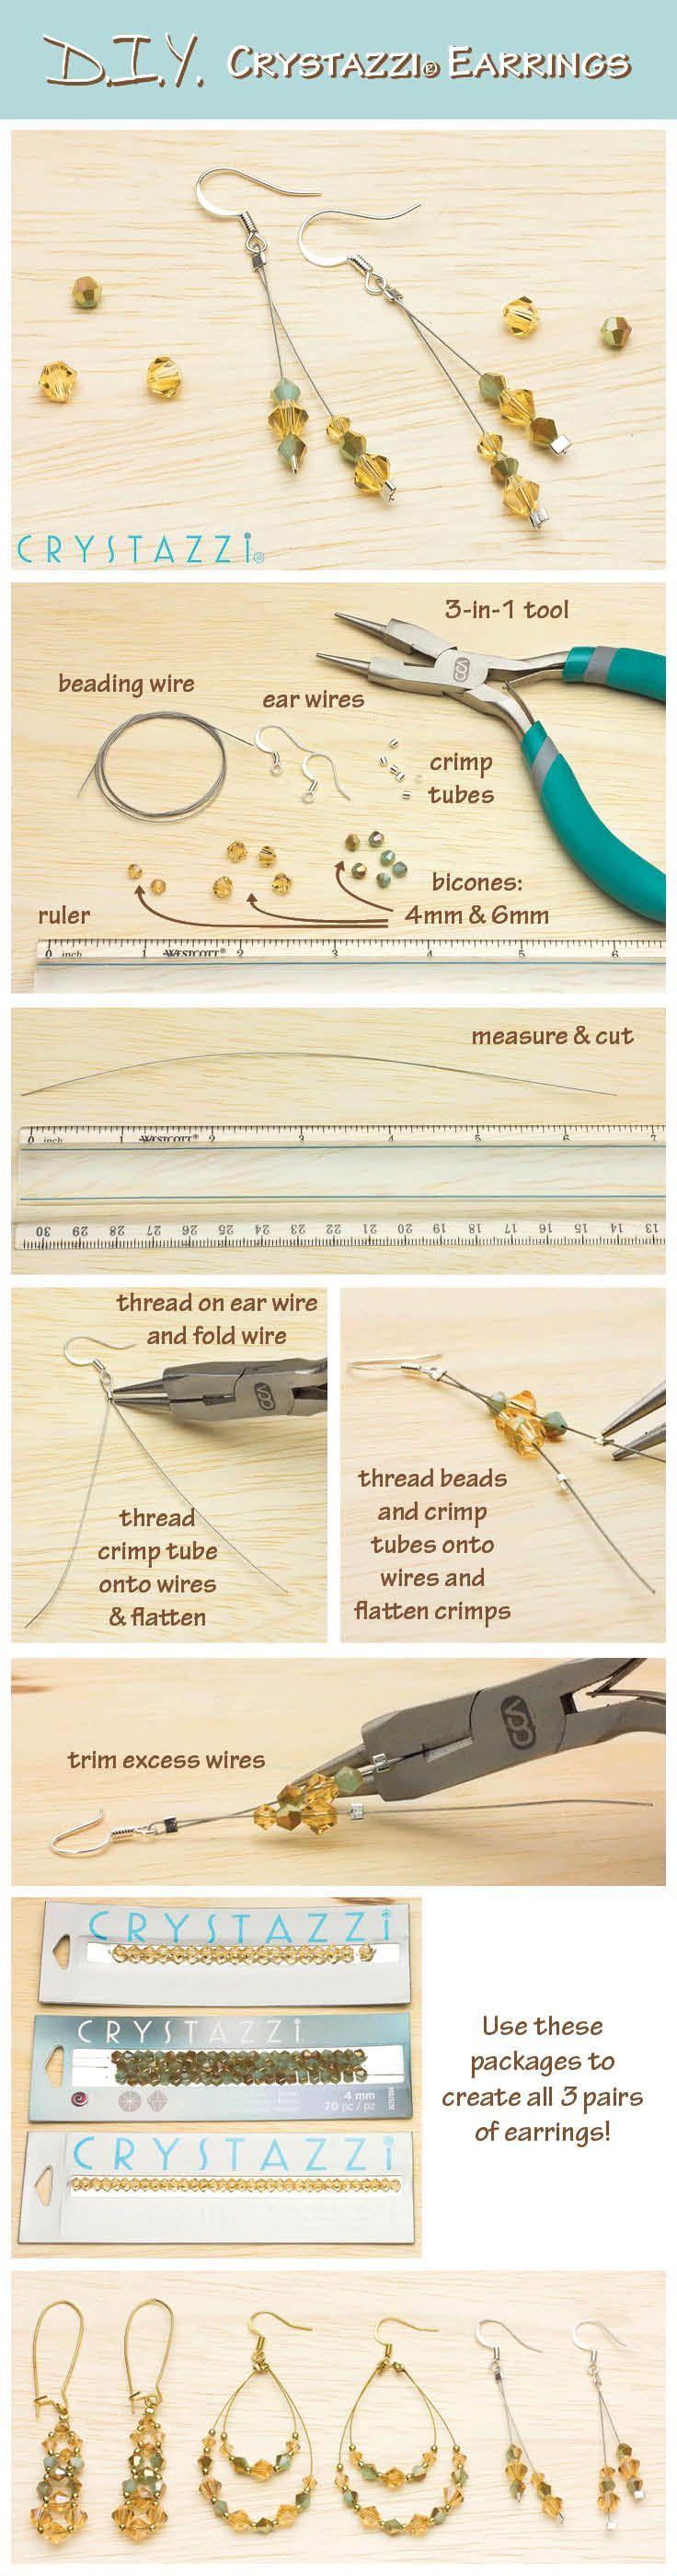 Crystazzi Earrings DIY Crystal Jewelry, DIY Crystal Jewelry - create earrings…